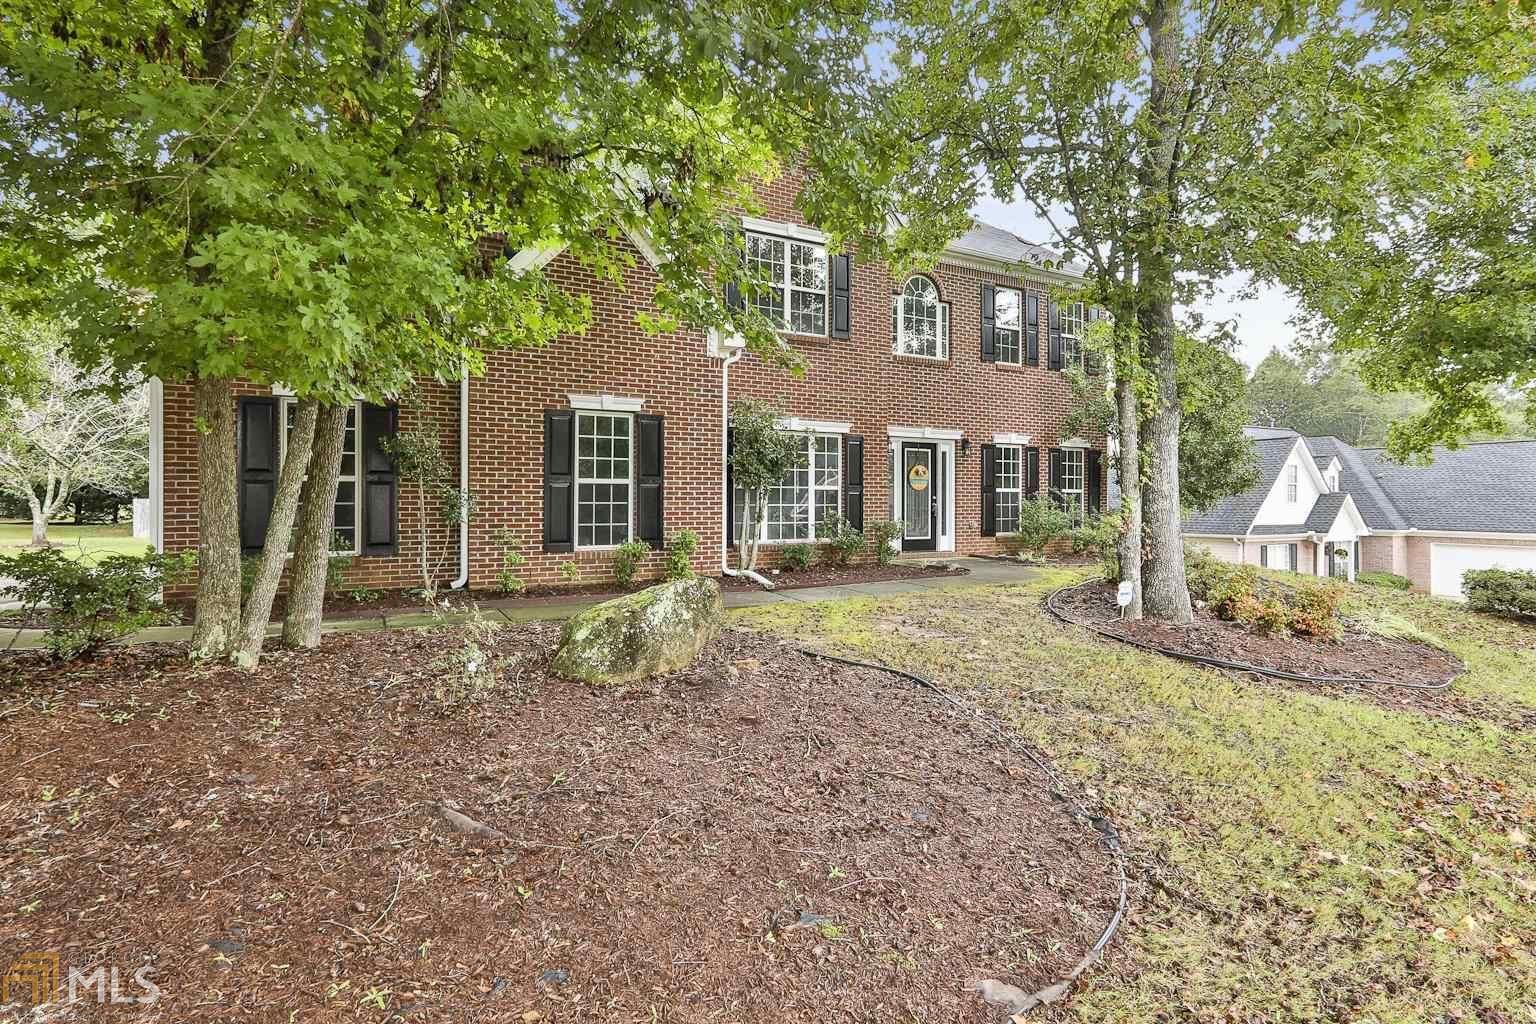 110 Stillwood Dr, Fayetteville, GA 30215 - MLS#: 8867433